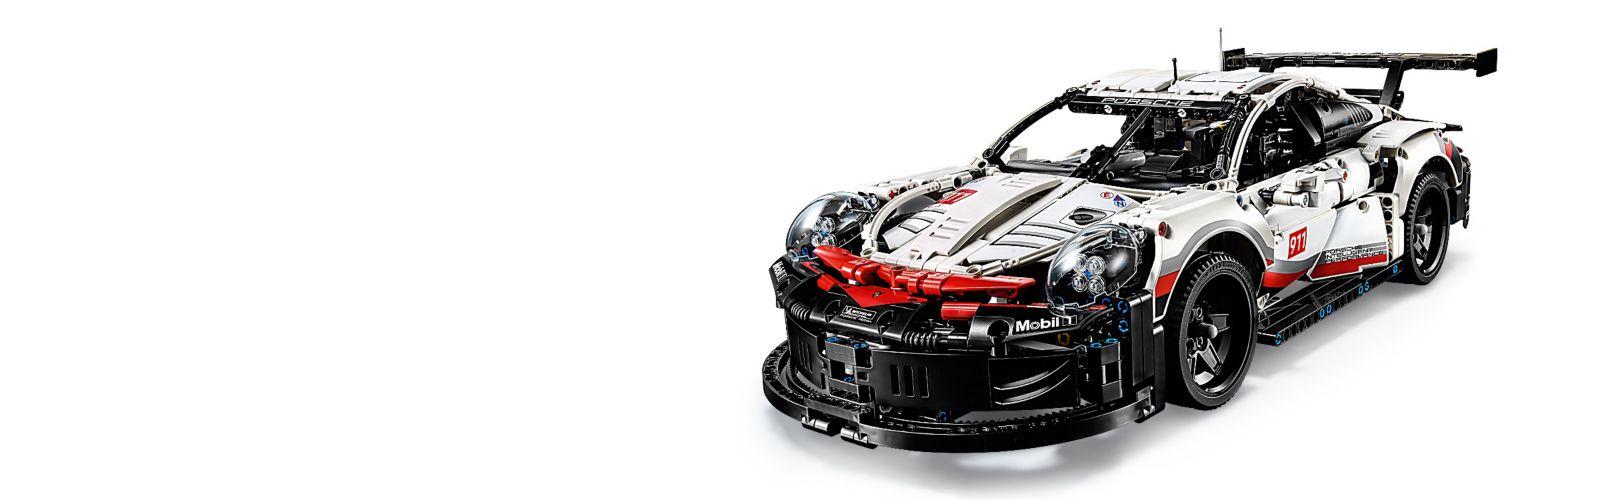 Porsche 911 Rsr 42096 Technic Buy Online At The Official Lego Shop Us